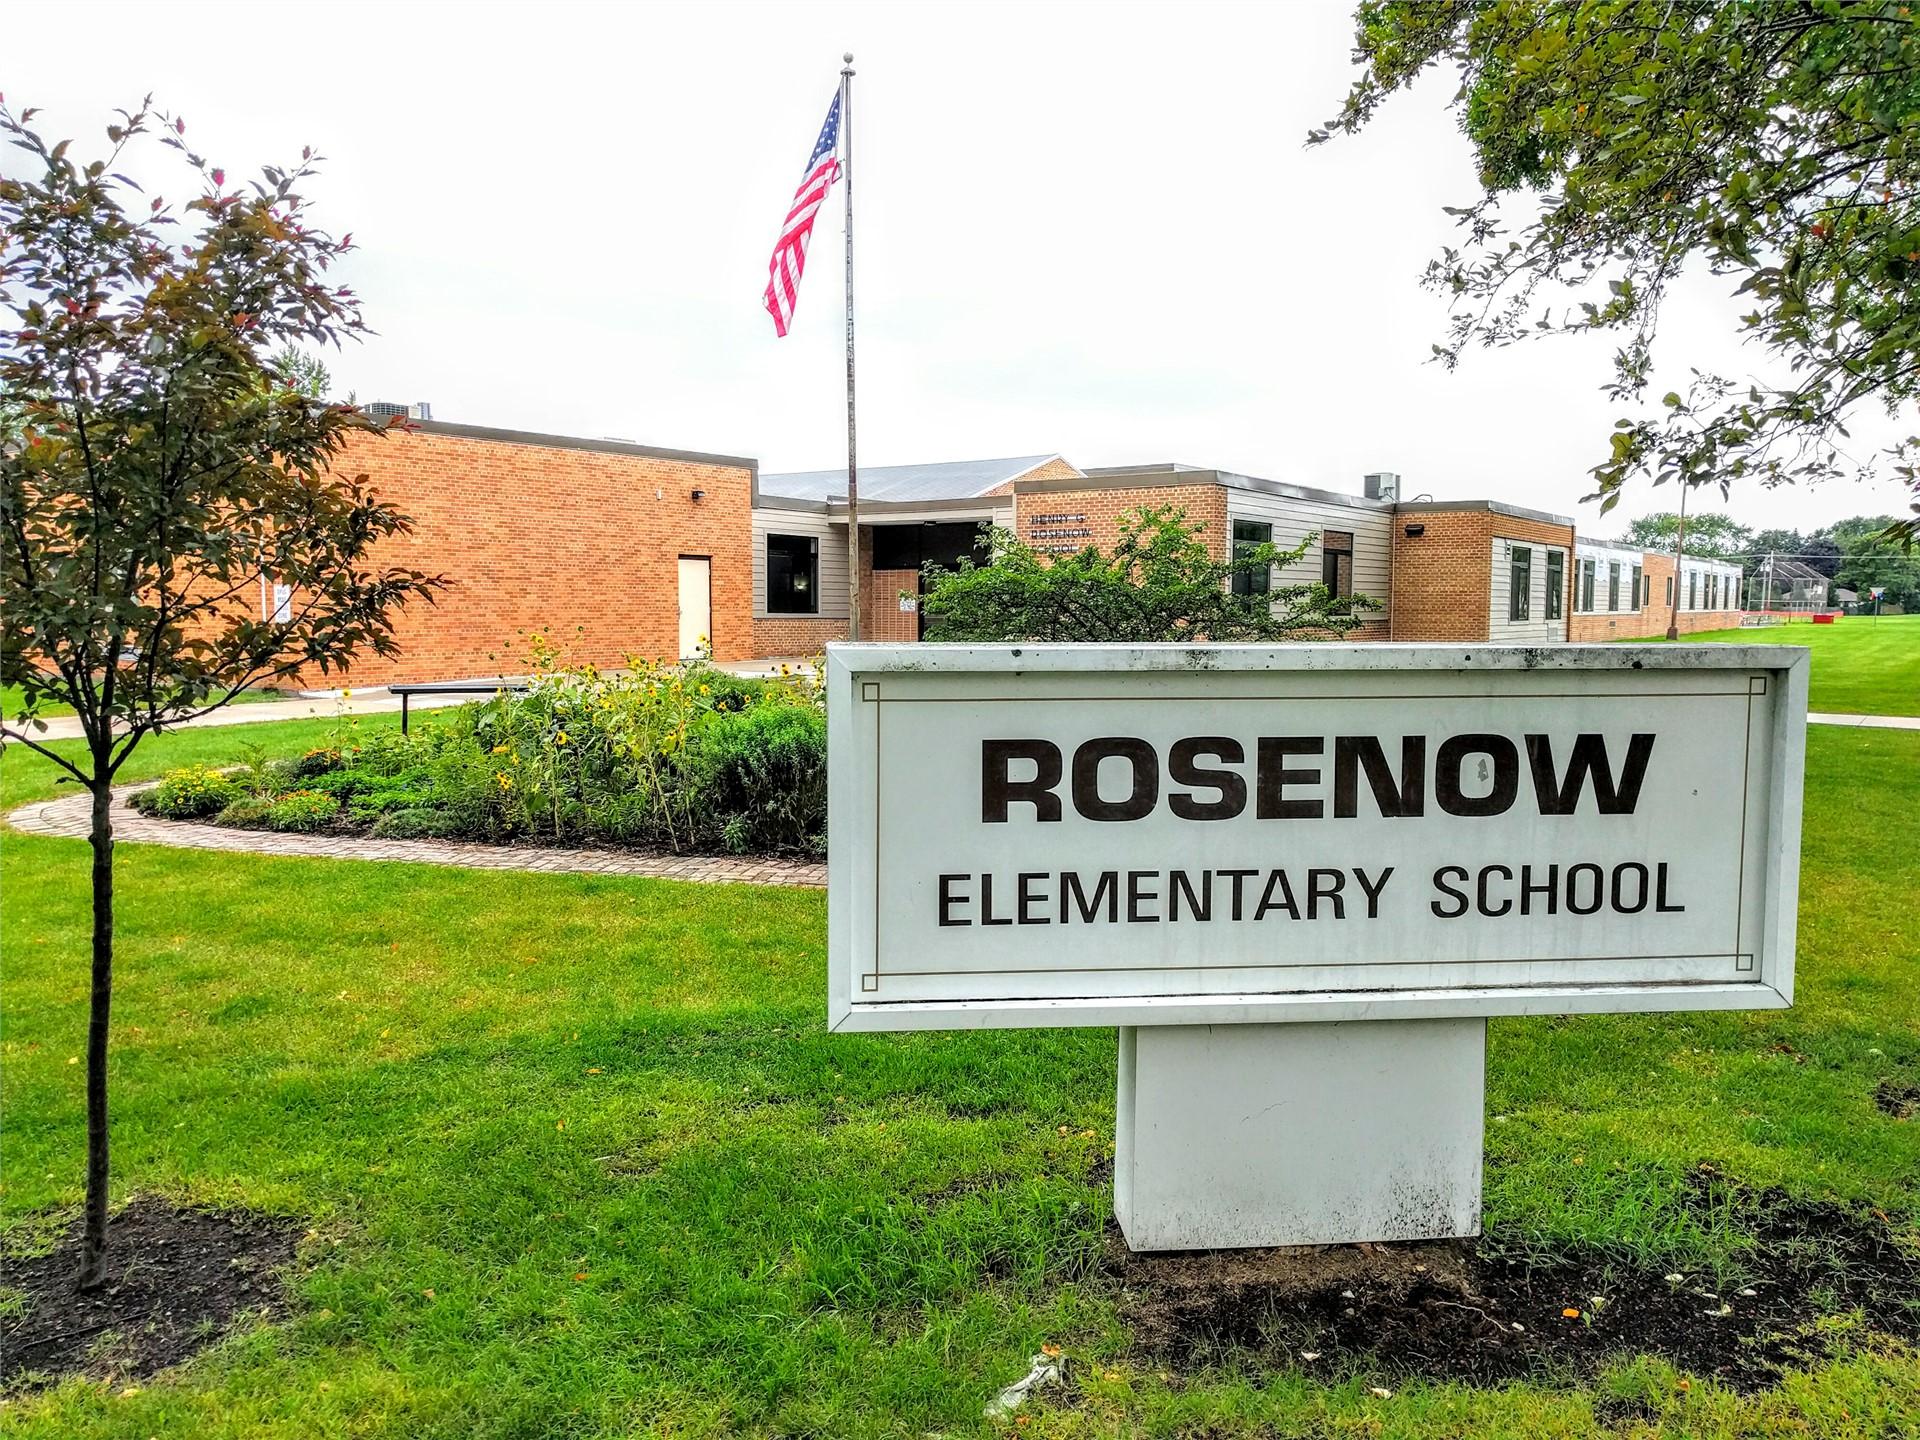 Henry Rosenow Elementary